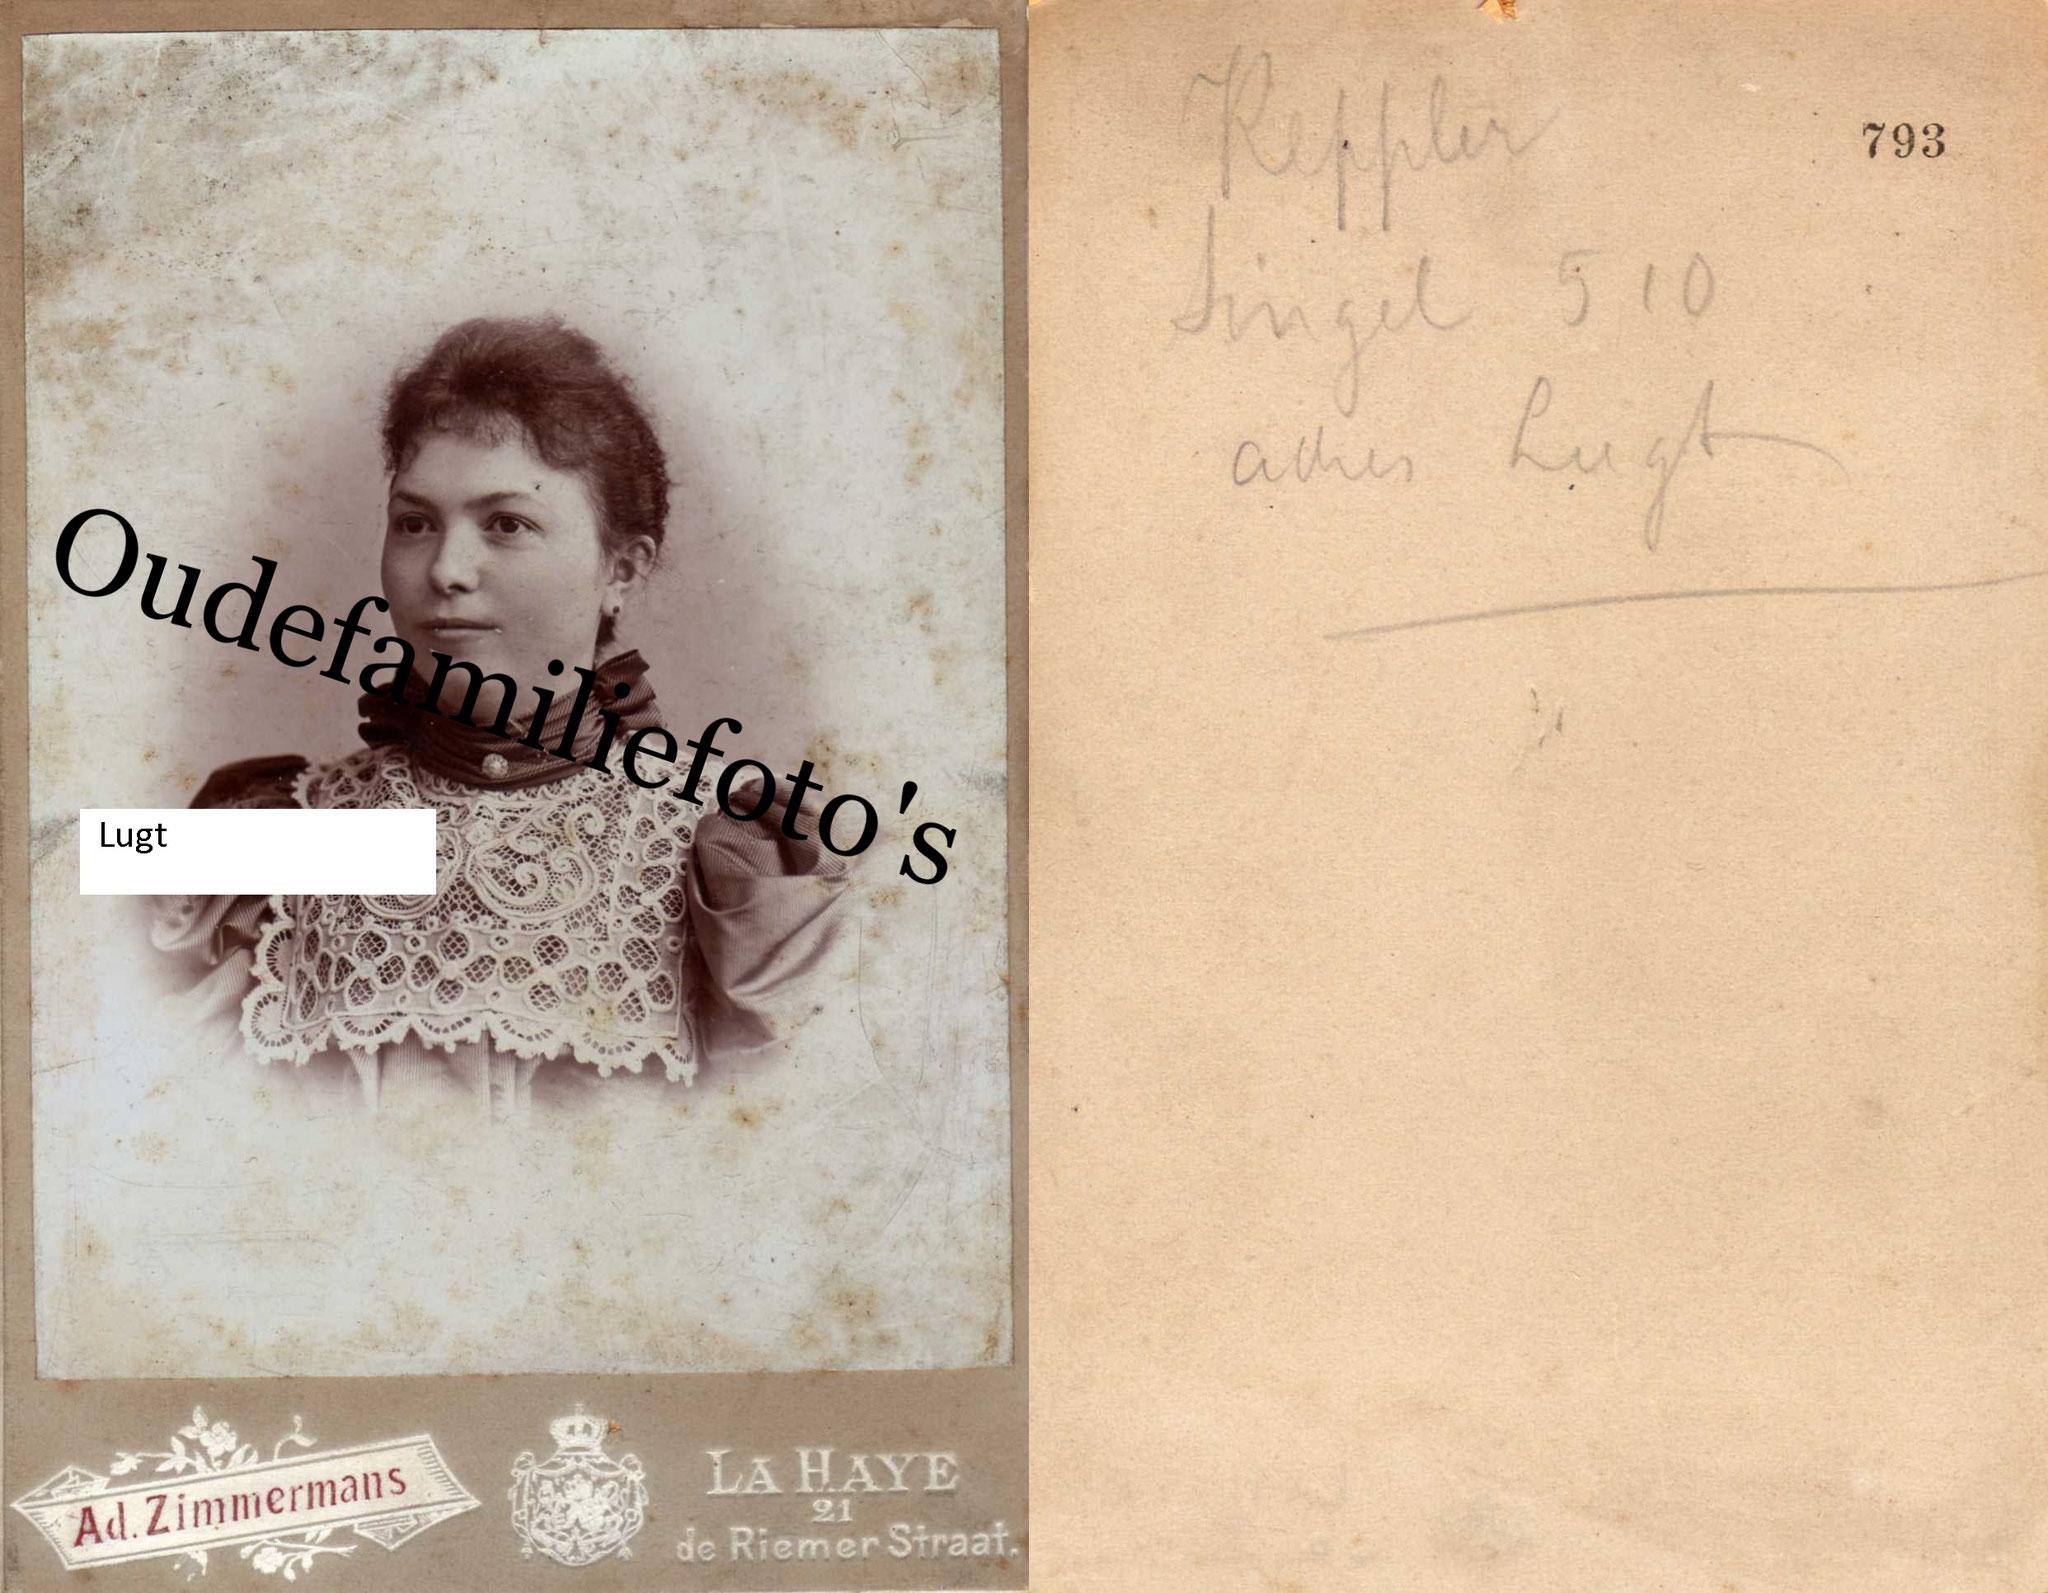 Lugt, Maria Christina. Geb. 4-6-1843 Amsterdam Ovl 4-11-1924 Hilversum getrouwd met J.G Keppler. € 4,00